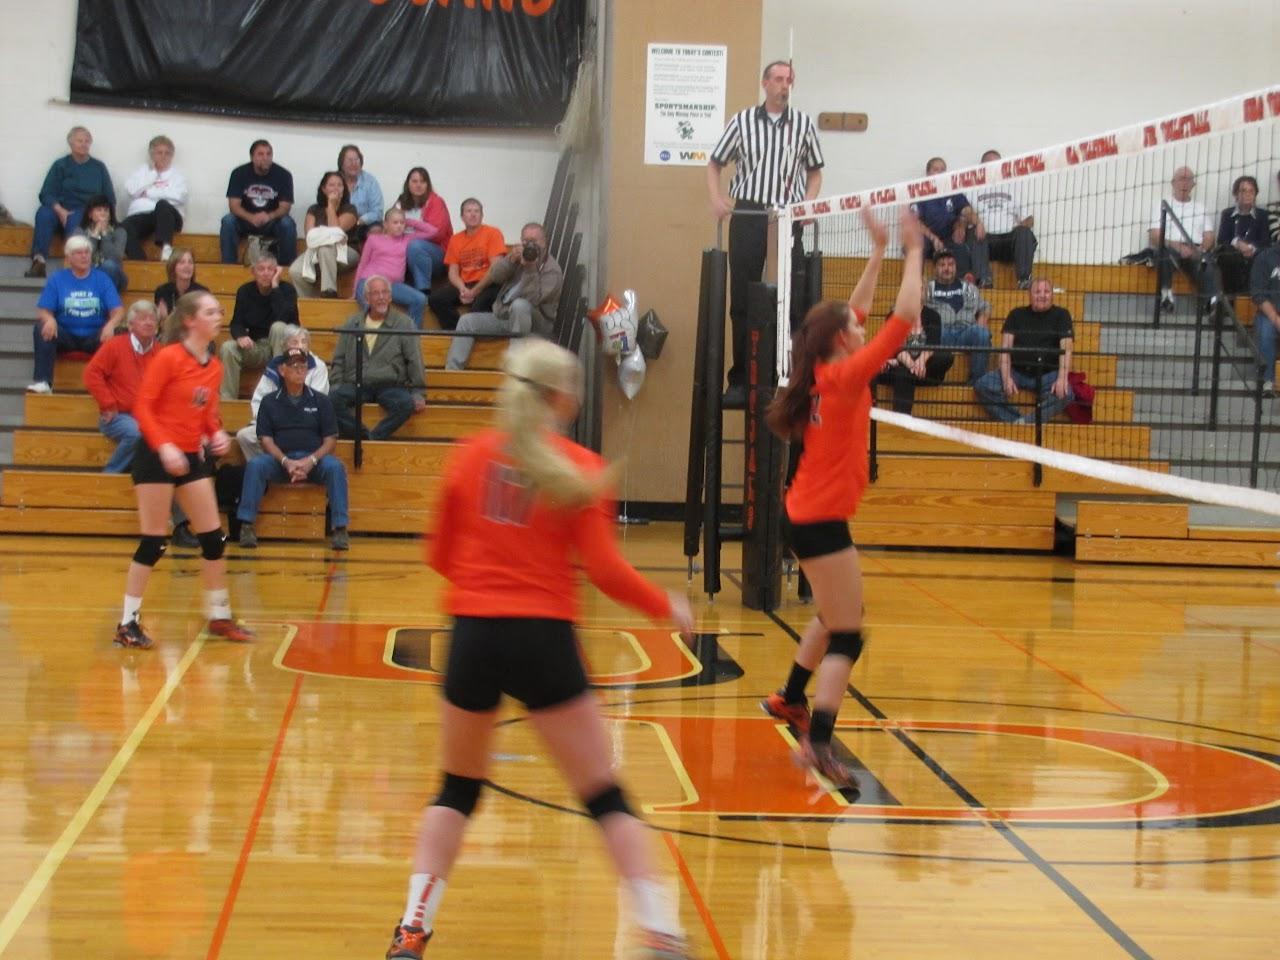 Volleyball-Millersburg vs UDA - IMG_7561.JPG